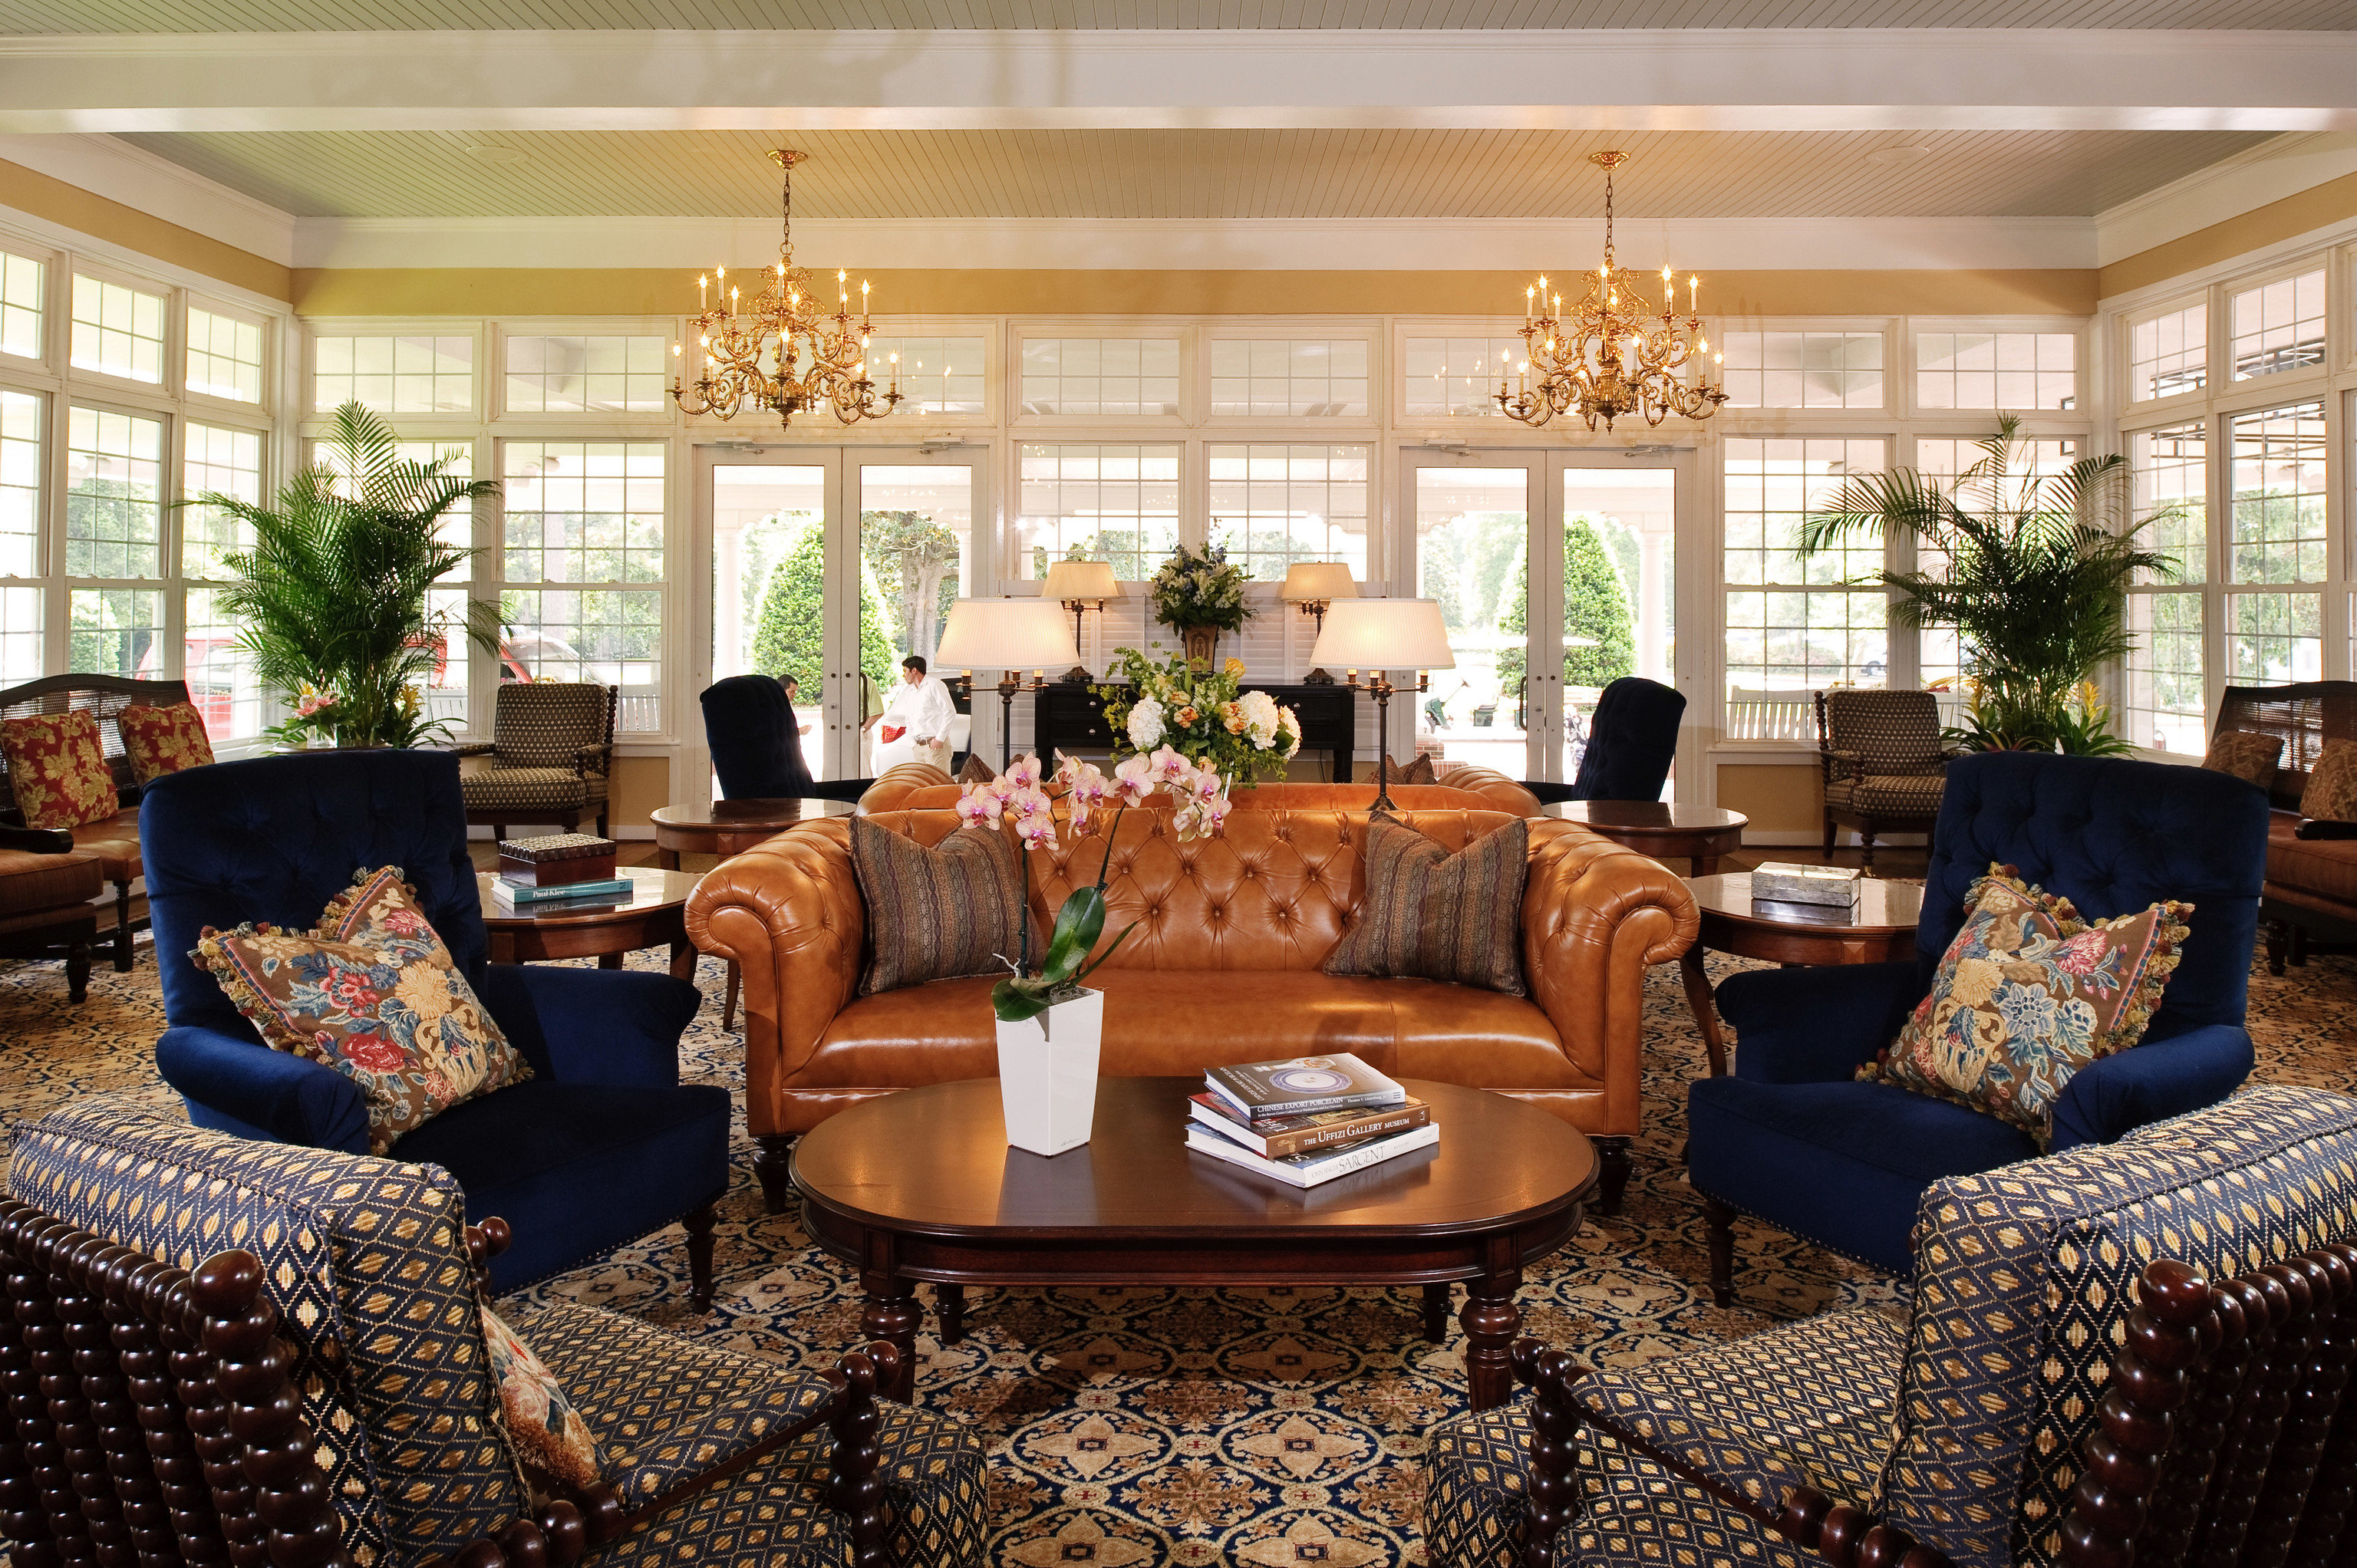 sofa living room property home hardwood Lobby condominium